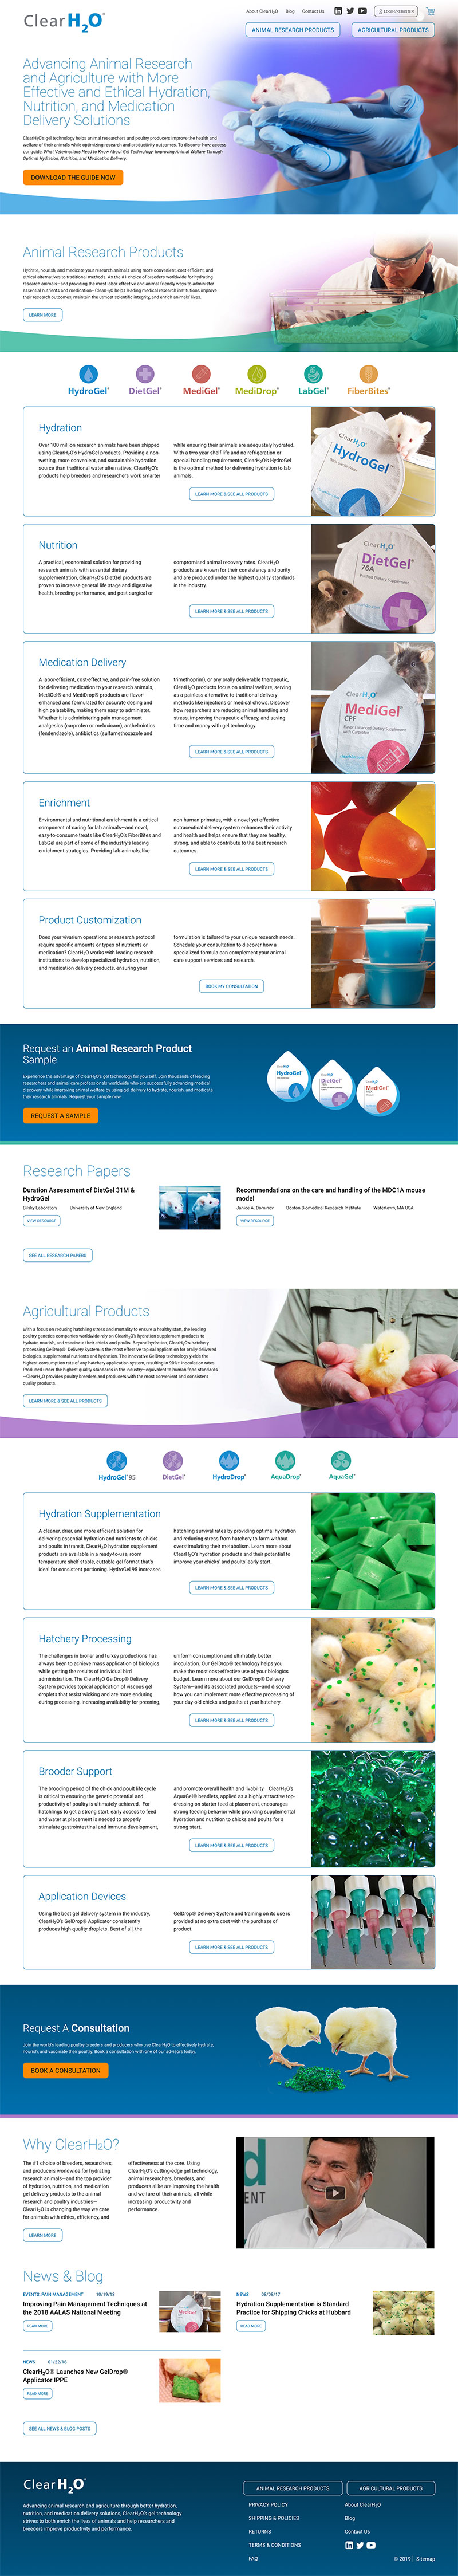 A screenshot of the ClearH2O homepage